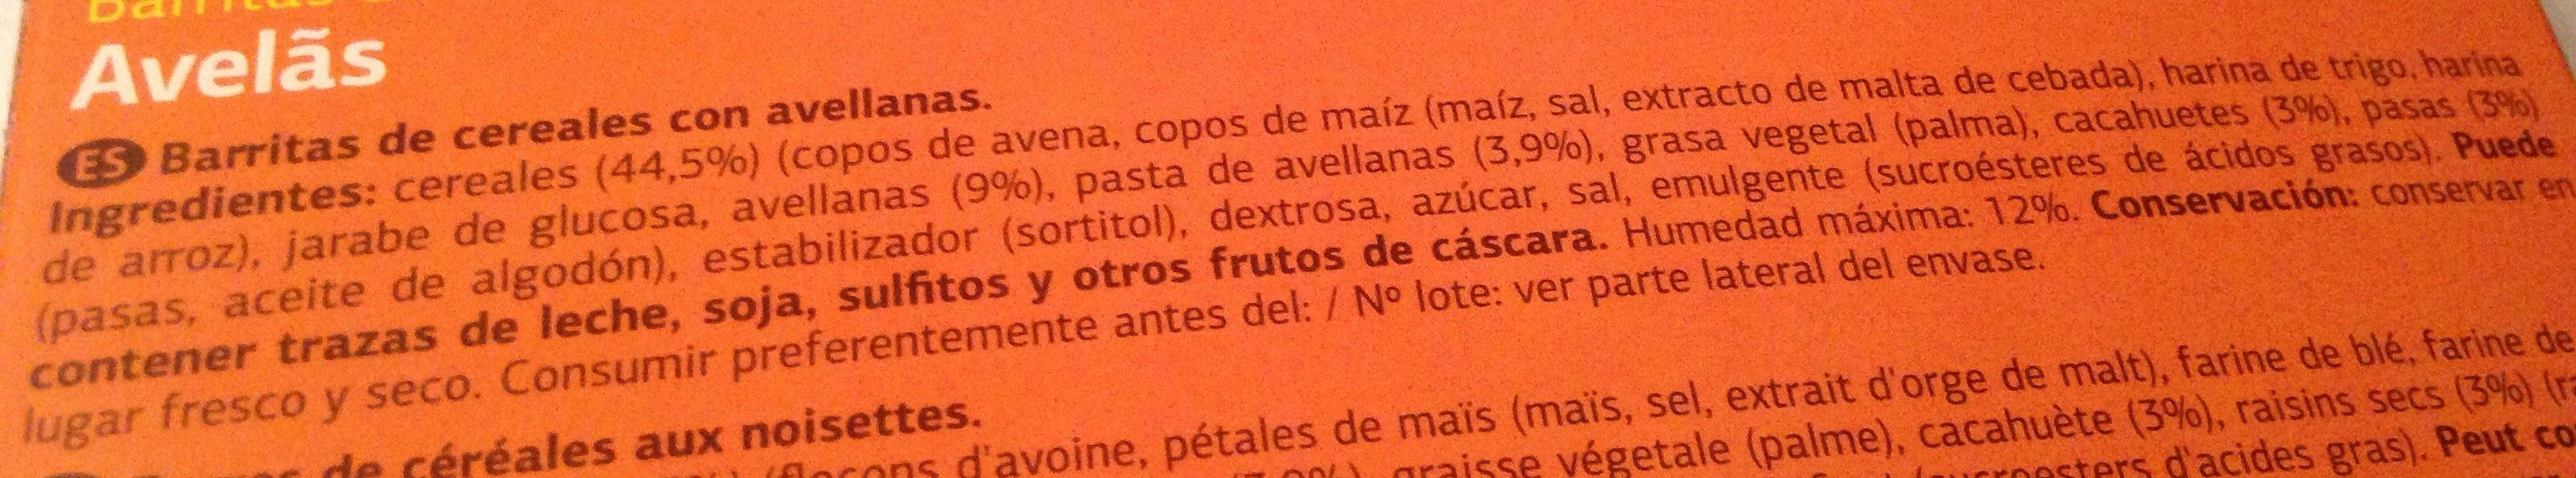 Barritas con Avellana - Ingredients